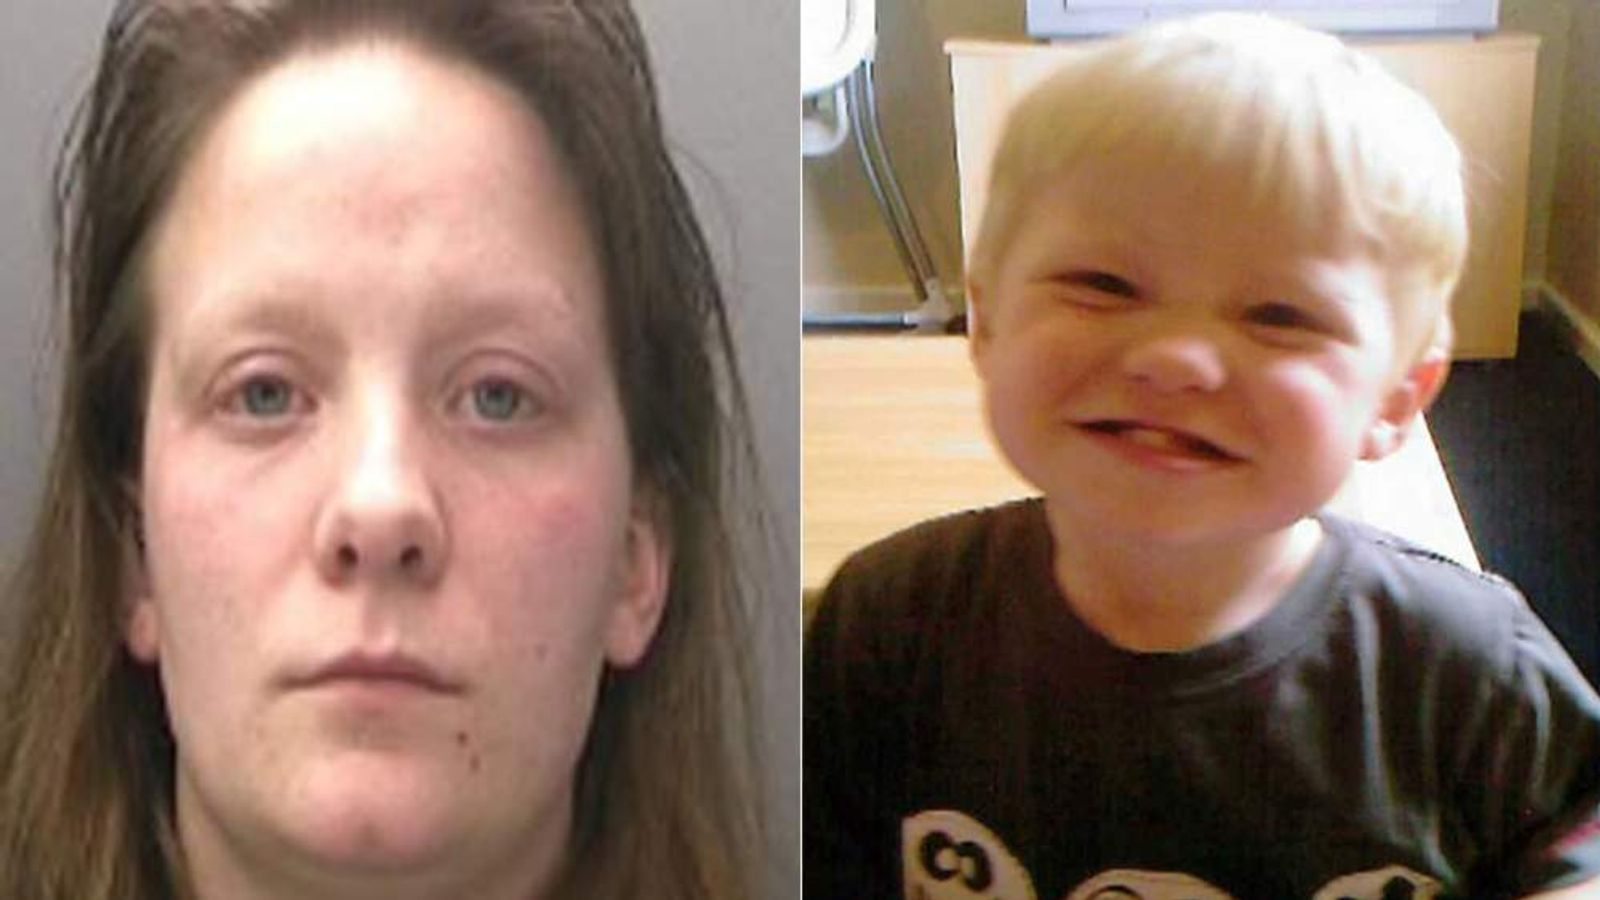 Rebecca Shuttleworth and her son Keanu Williams